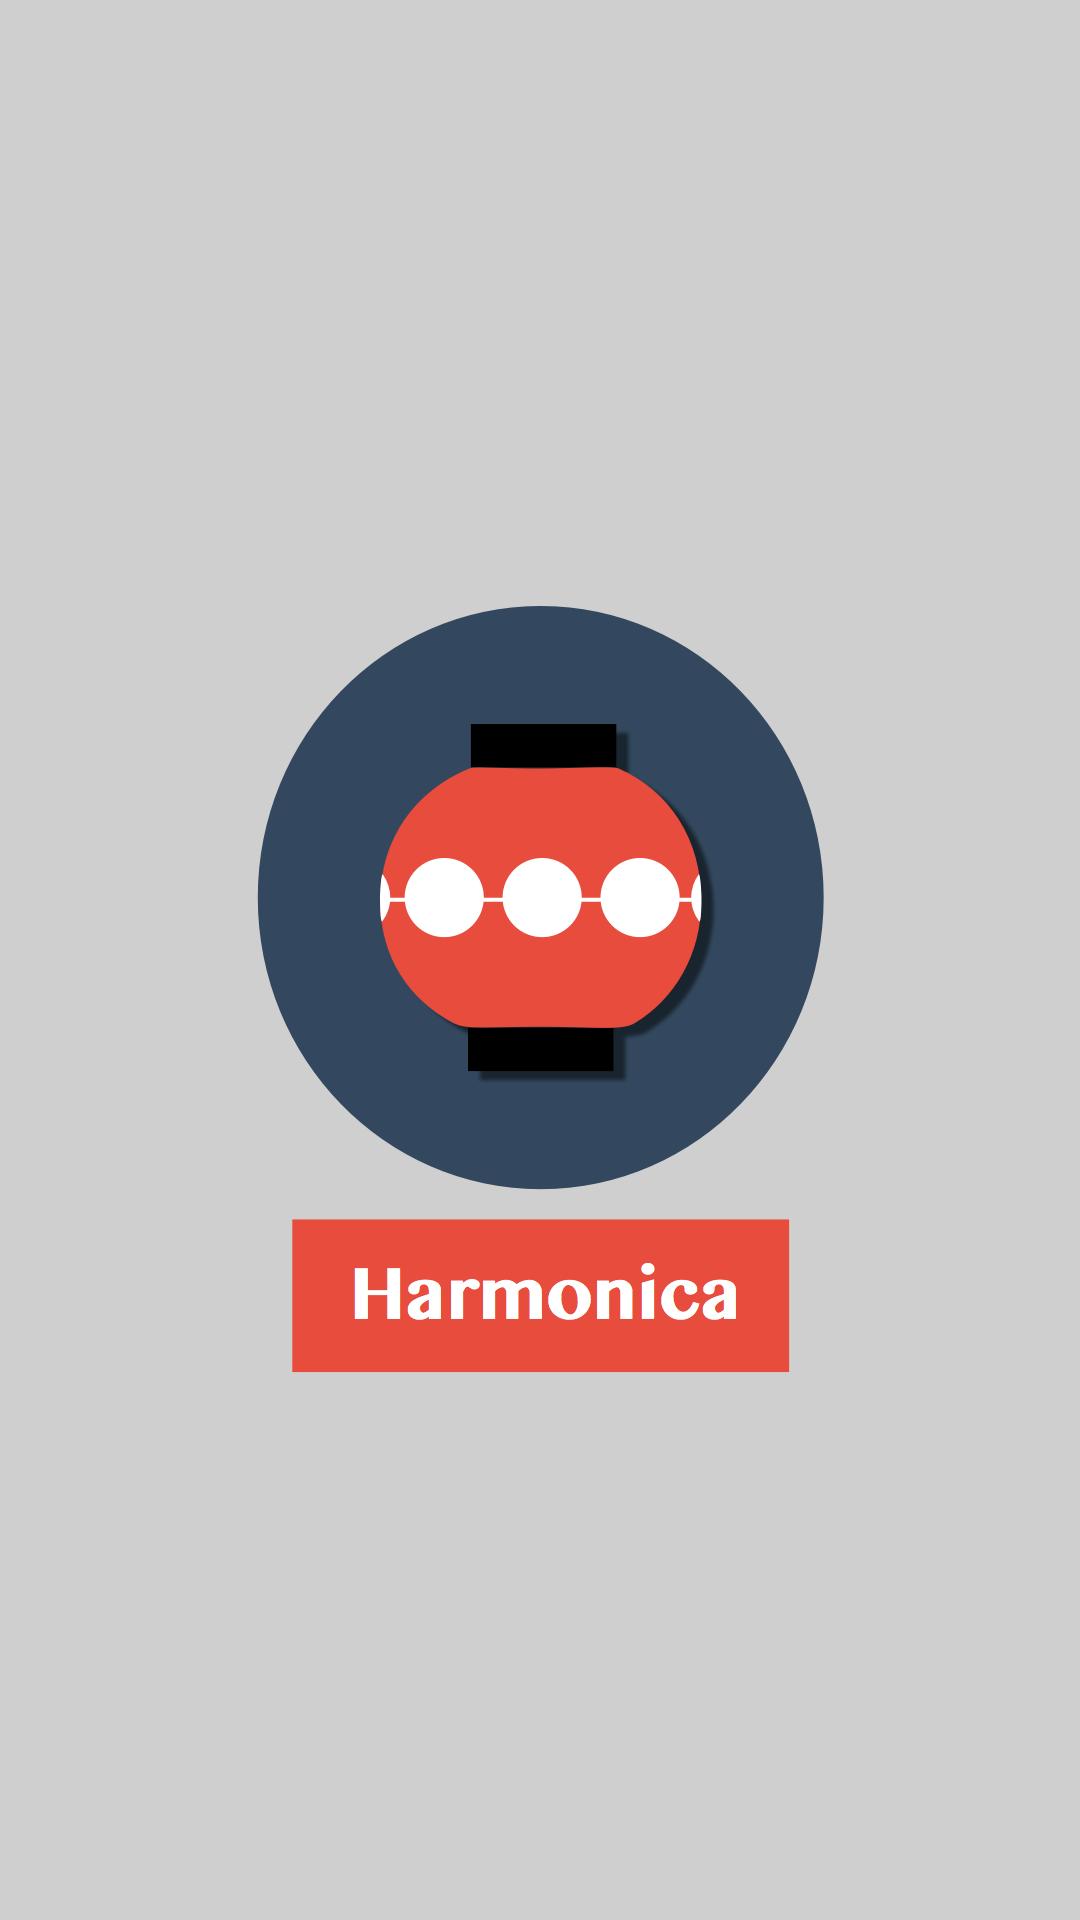 harmonicaForiPhone6Plus